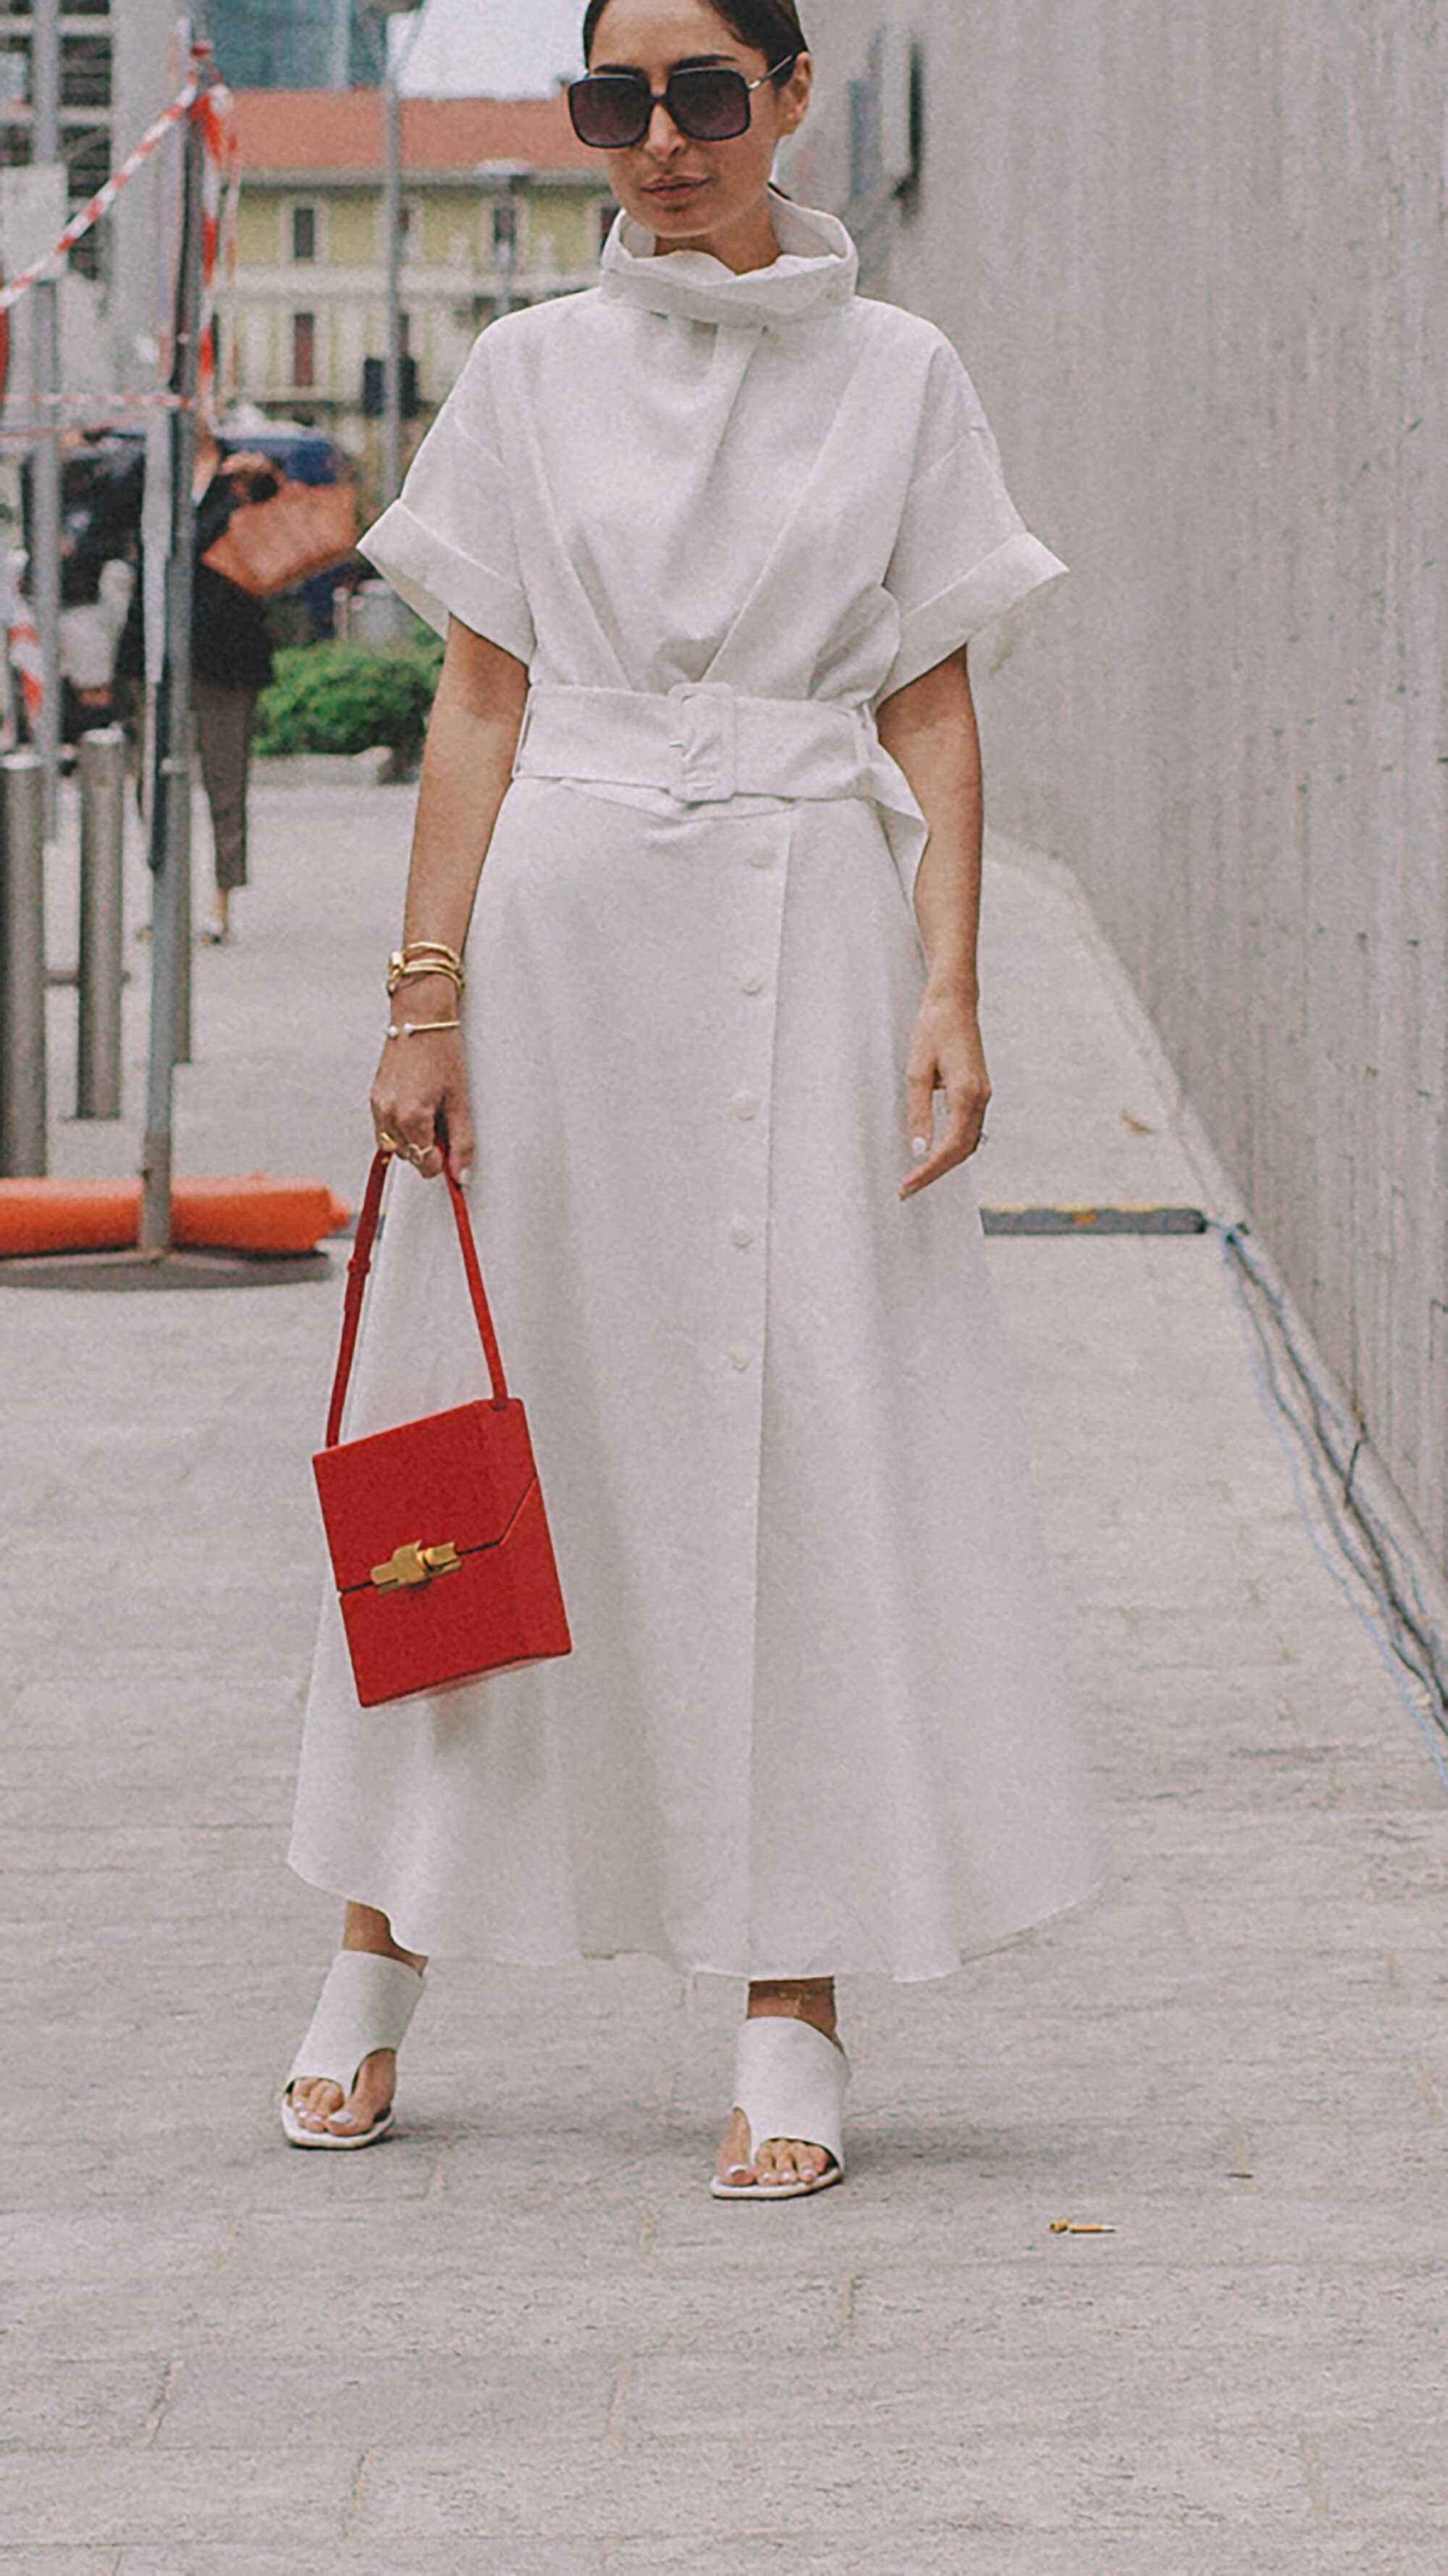 Best outfits of Milan Fashion Week street style 2019 day three MFW SS20 Photo by @J2martinez -36.jpg